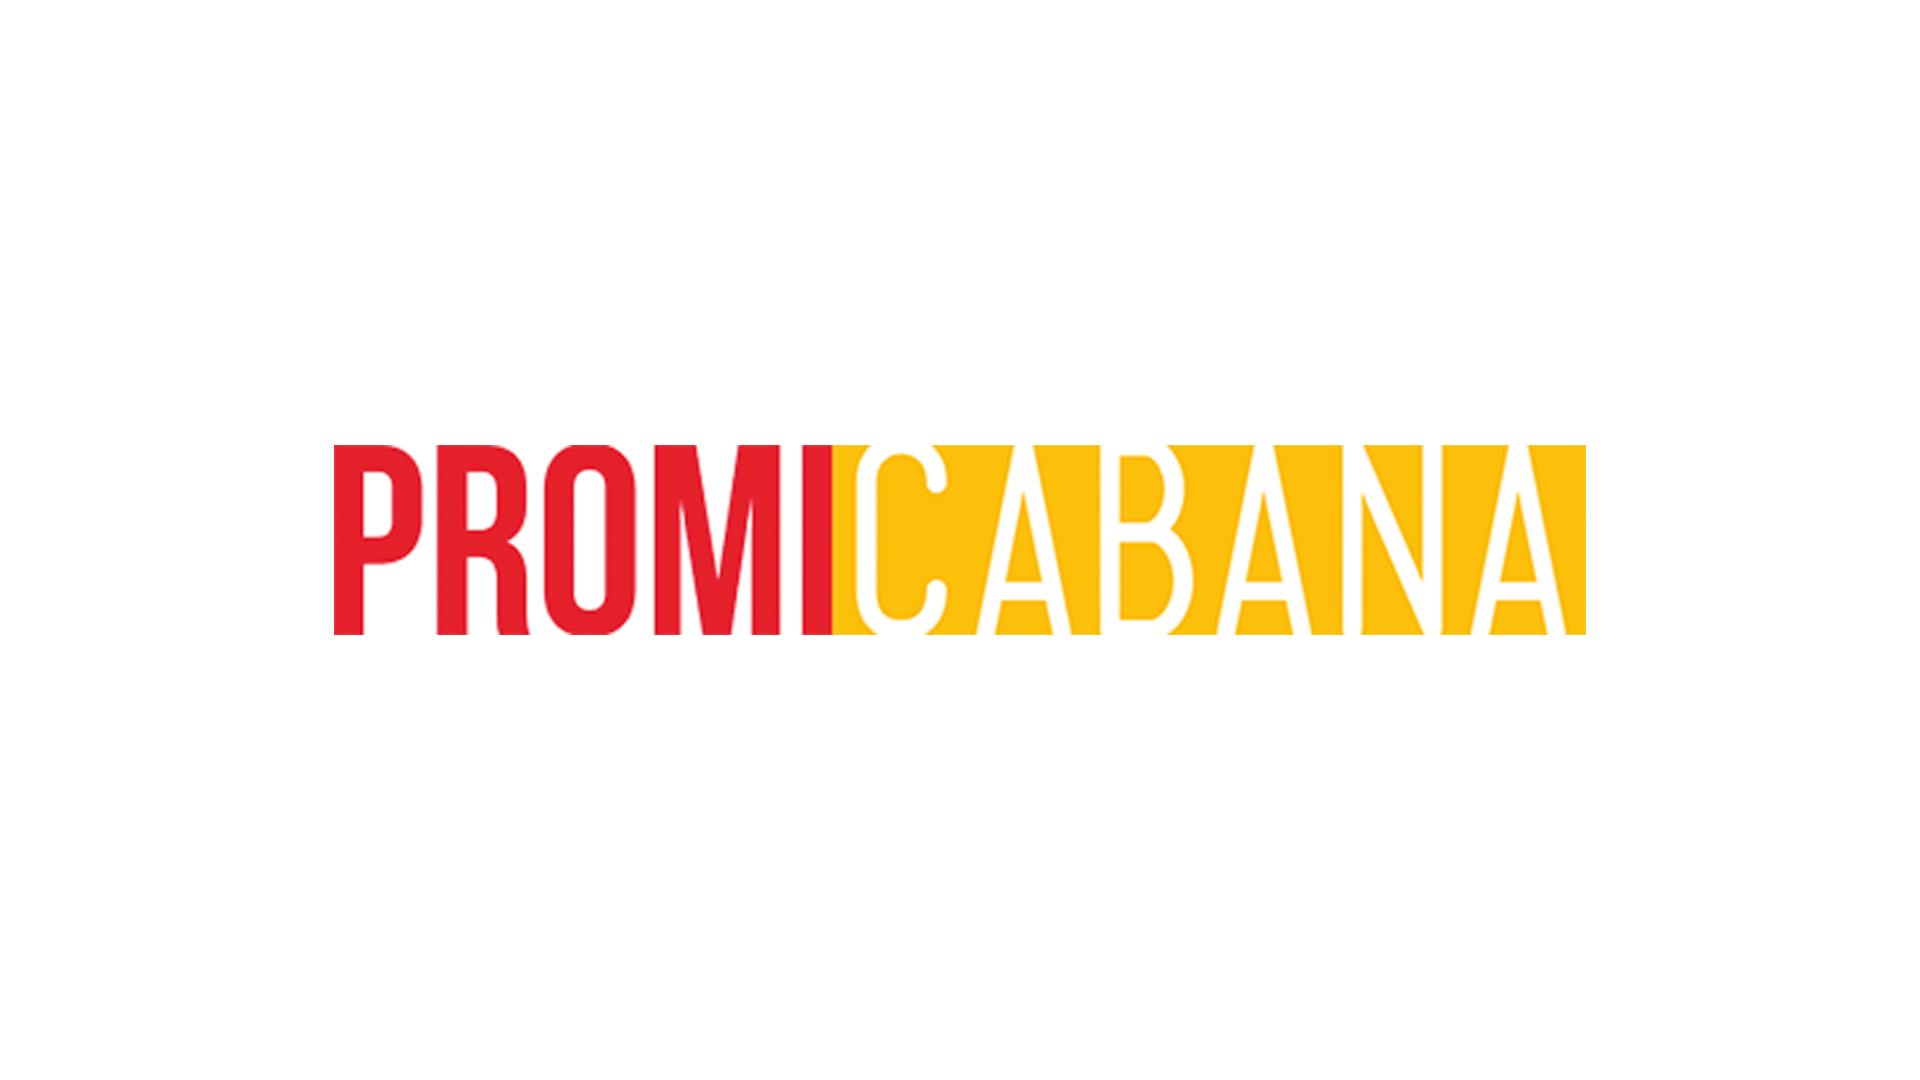 Eddie-Redmayne-Benedict-Cumberbatch-The-Graham-Norton-Show